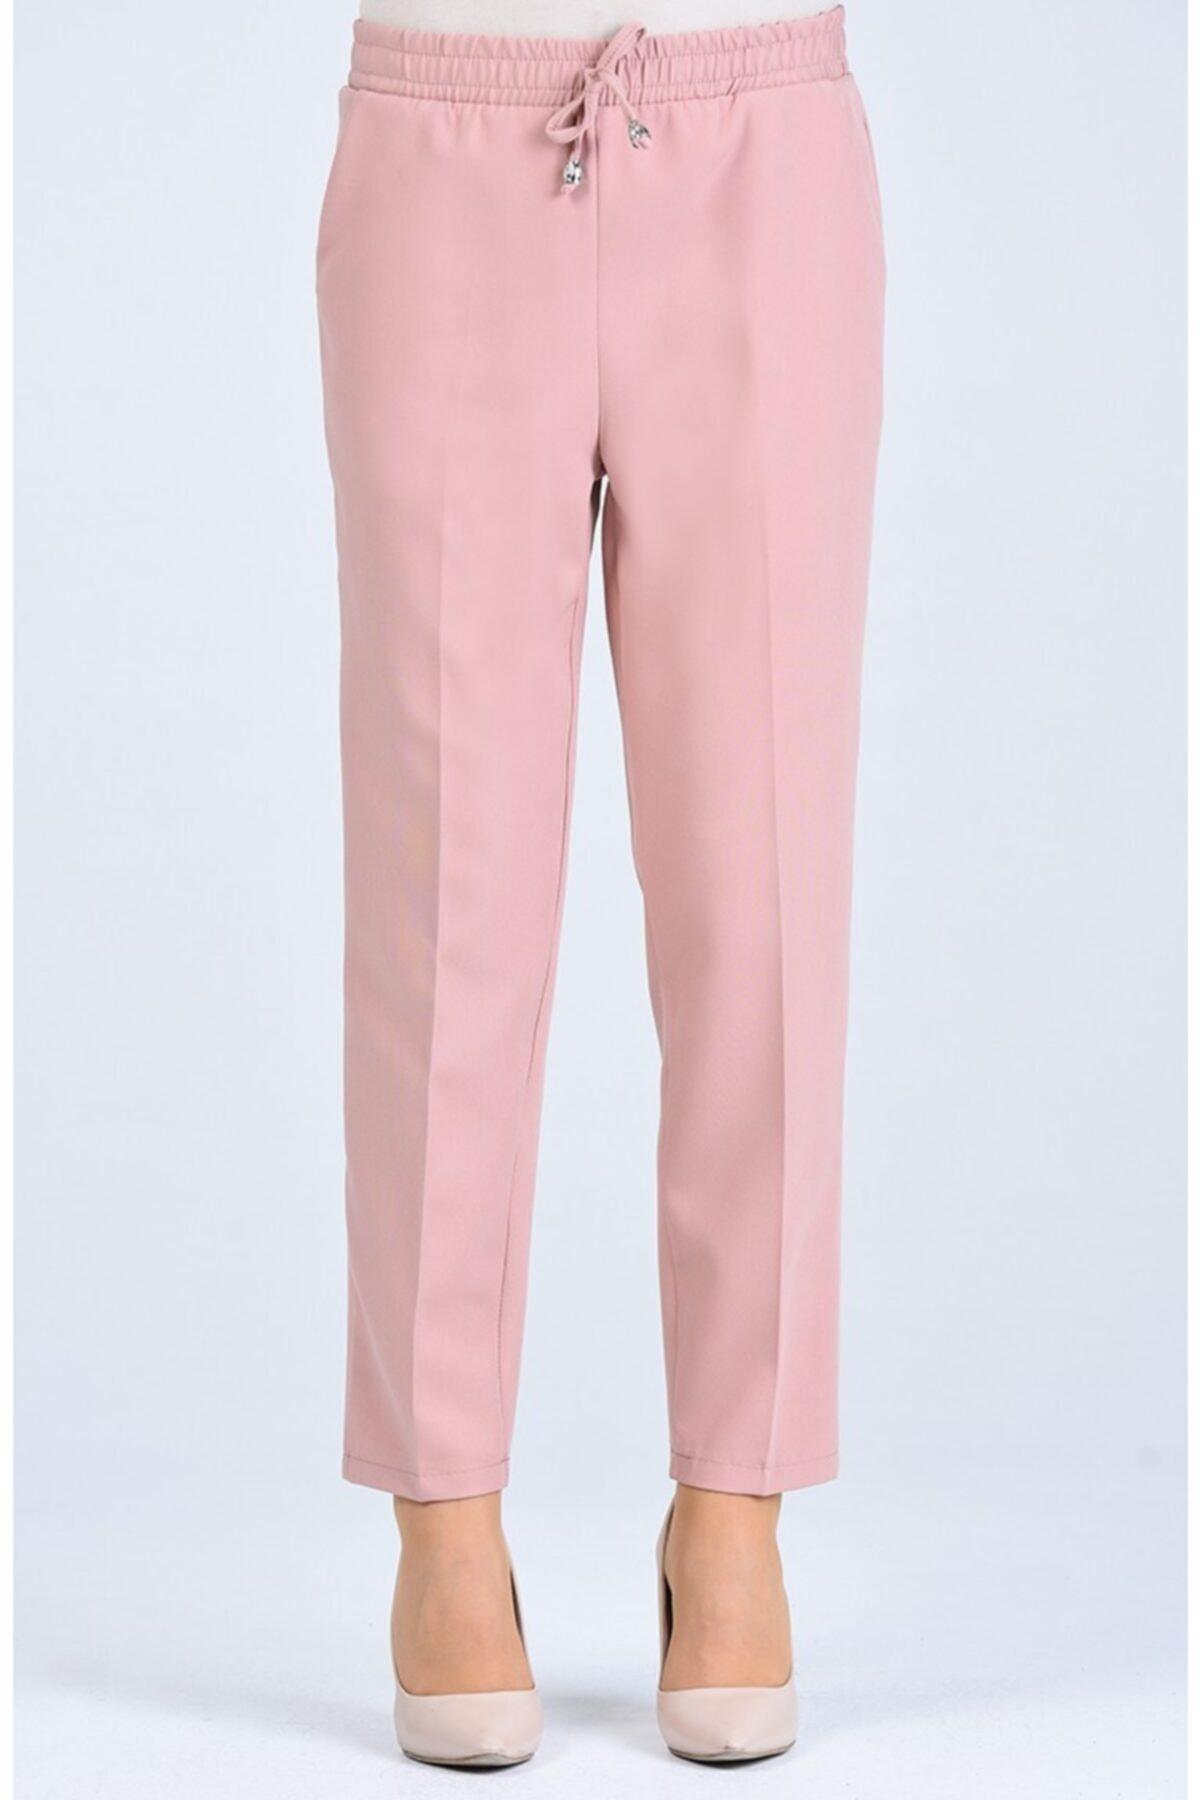 Kadın Lastikli Havuç Pantolon - Me000273